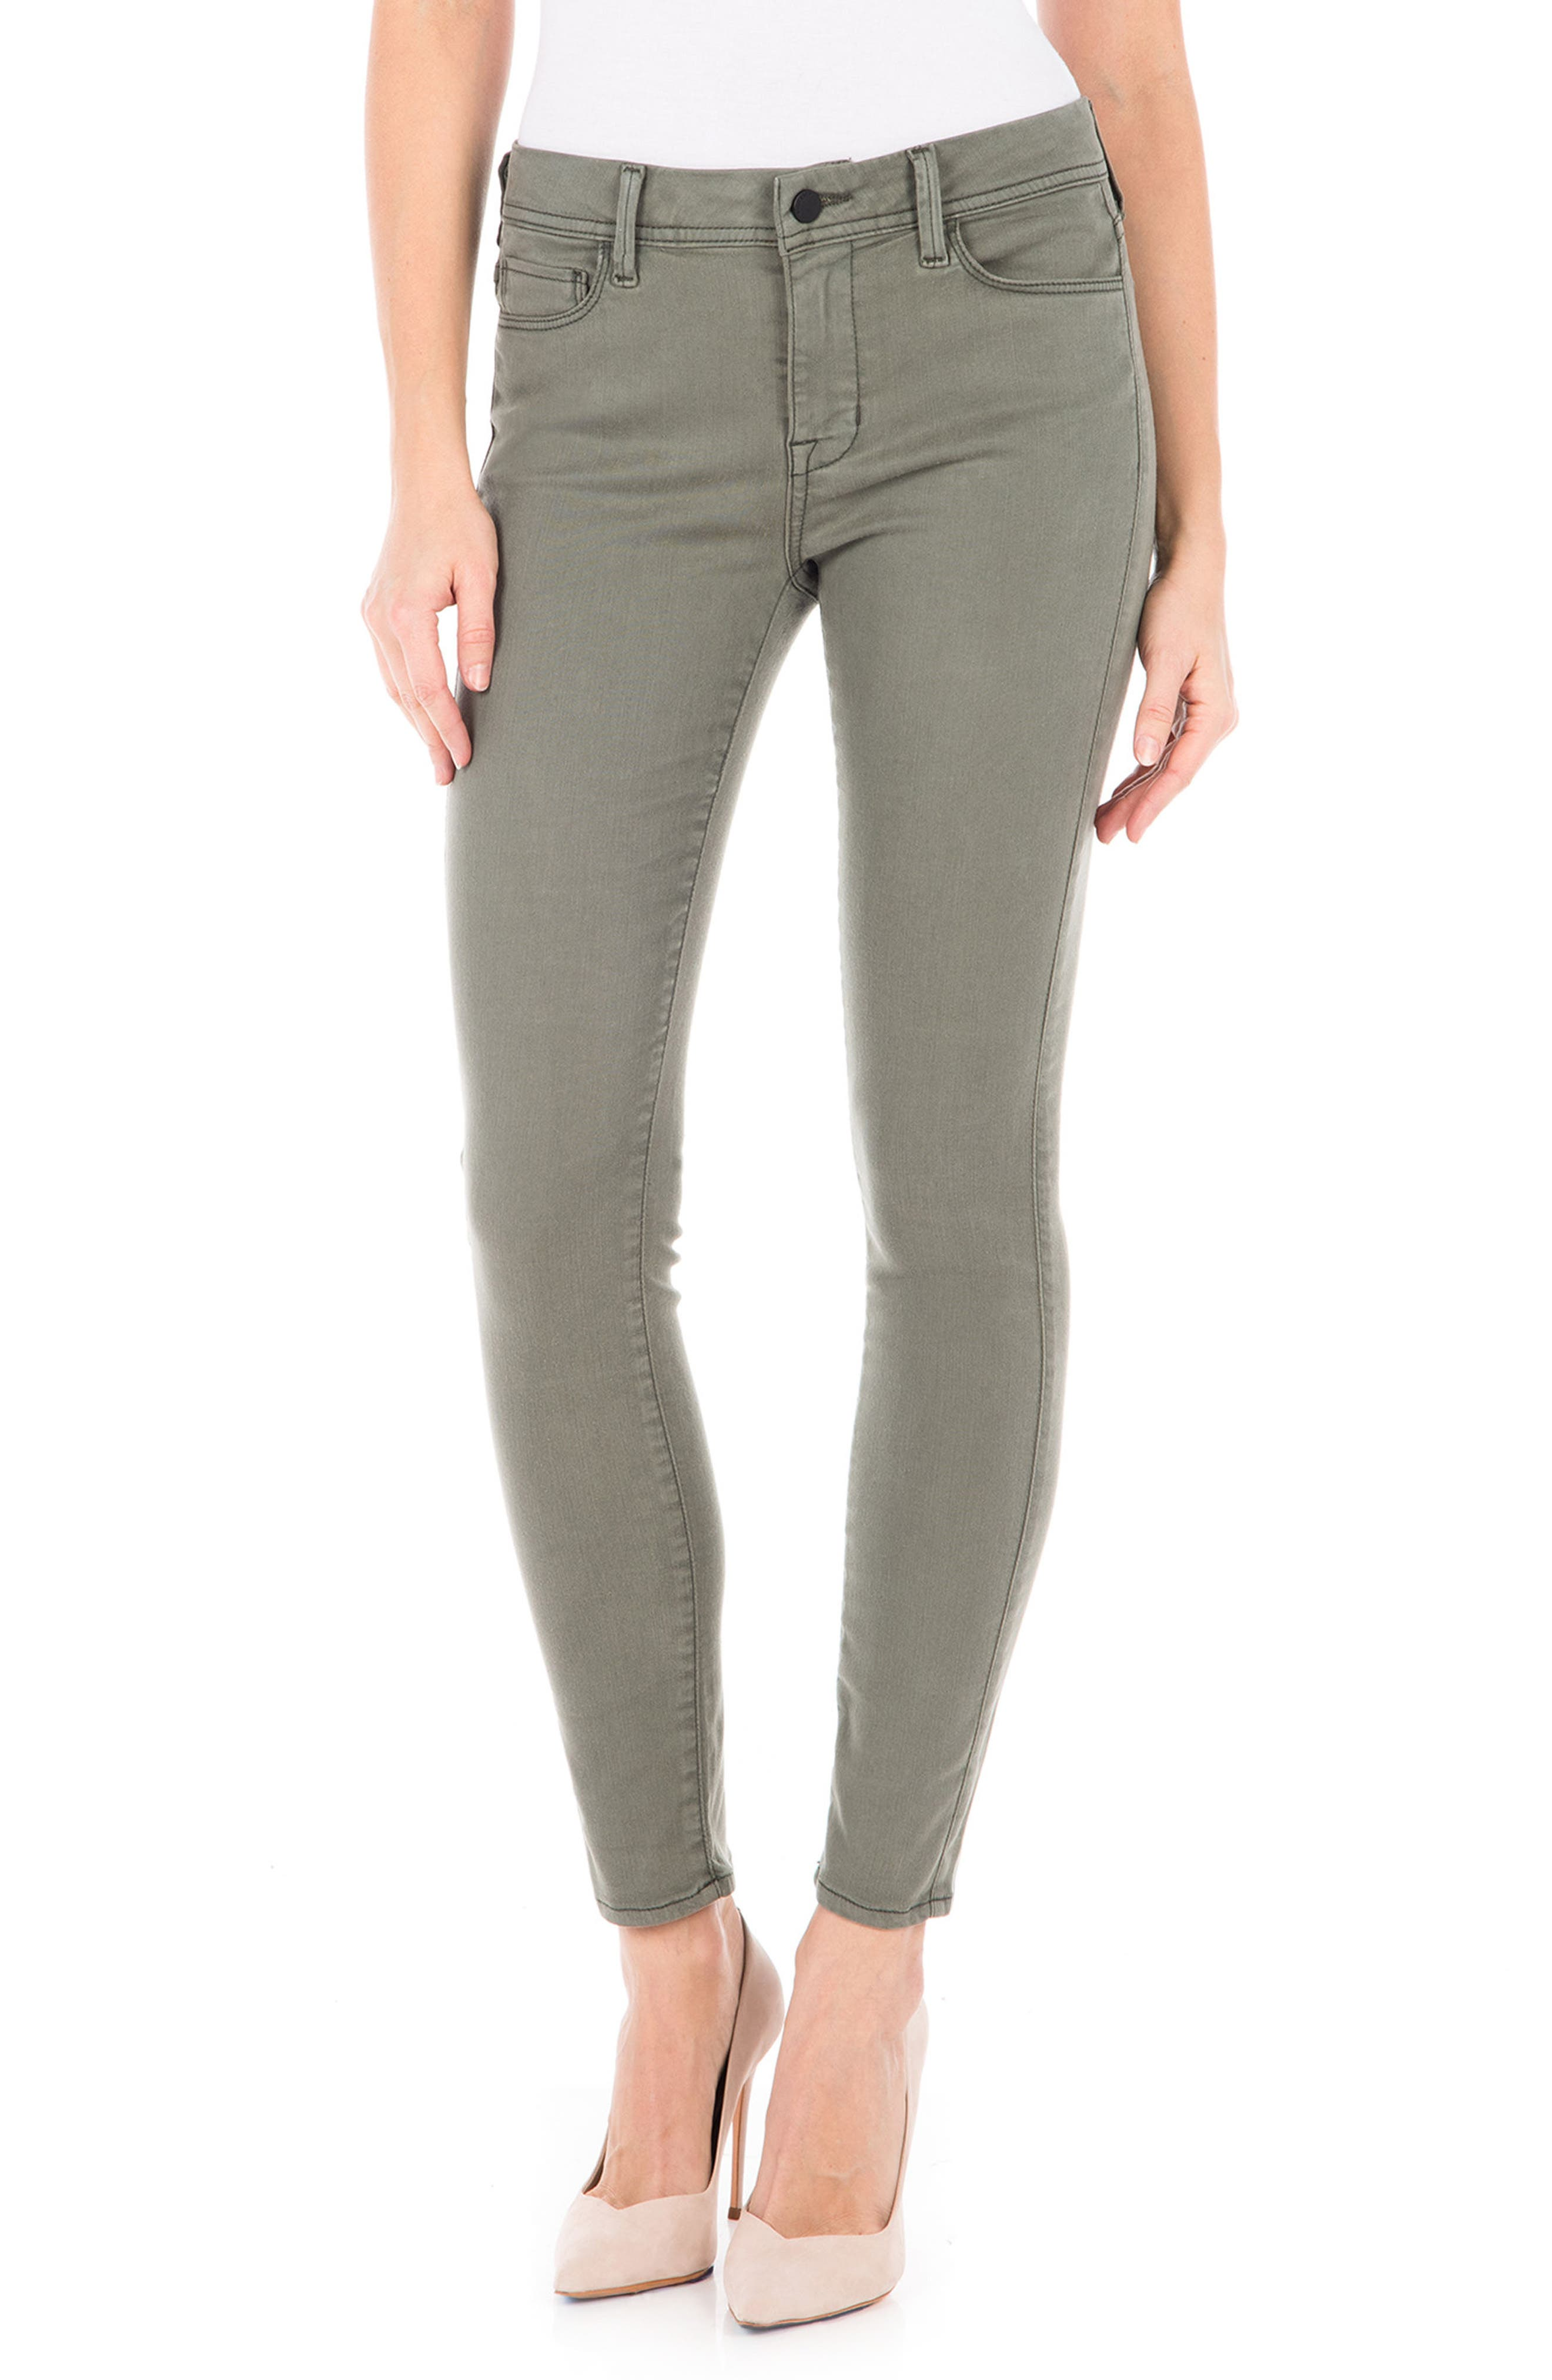 Sola Skinny Jeans,                             Main thumbnail 1, color,                             300